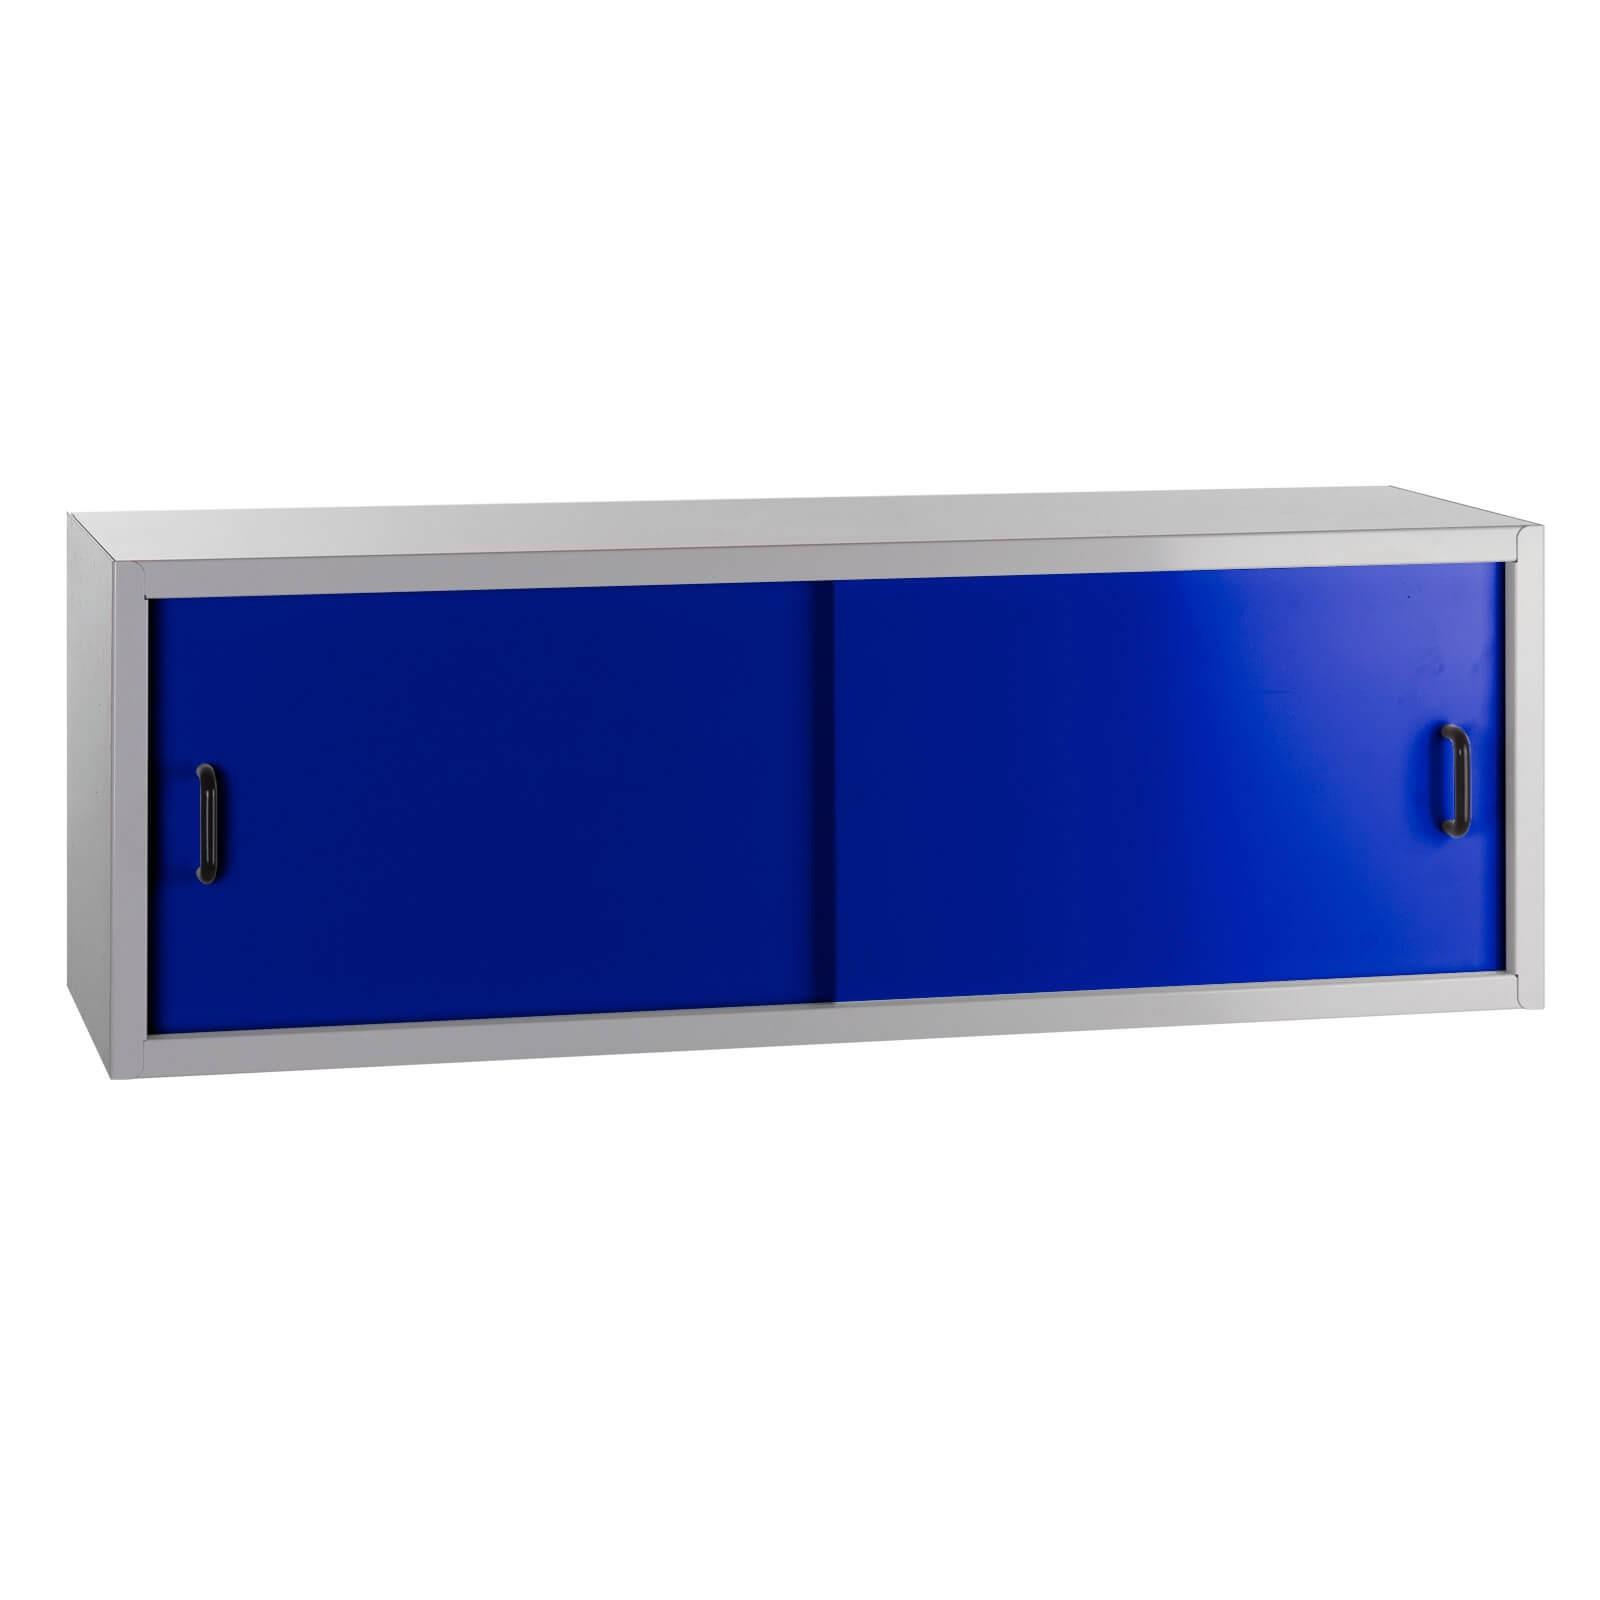 metall h ngeschrank wandschrank fernando 2 schiebet ren blau hellgrau. Black Bedroom Furniture Sets. Home Design Ideas